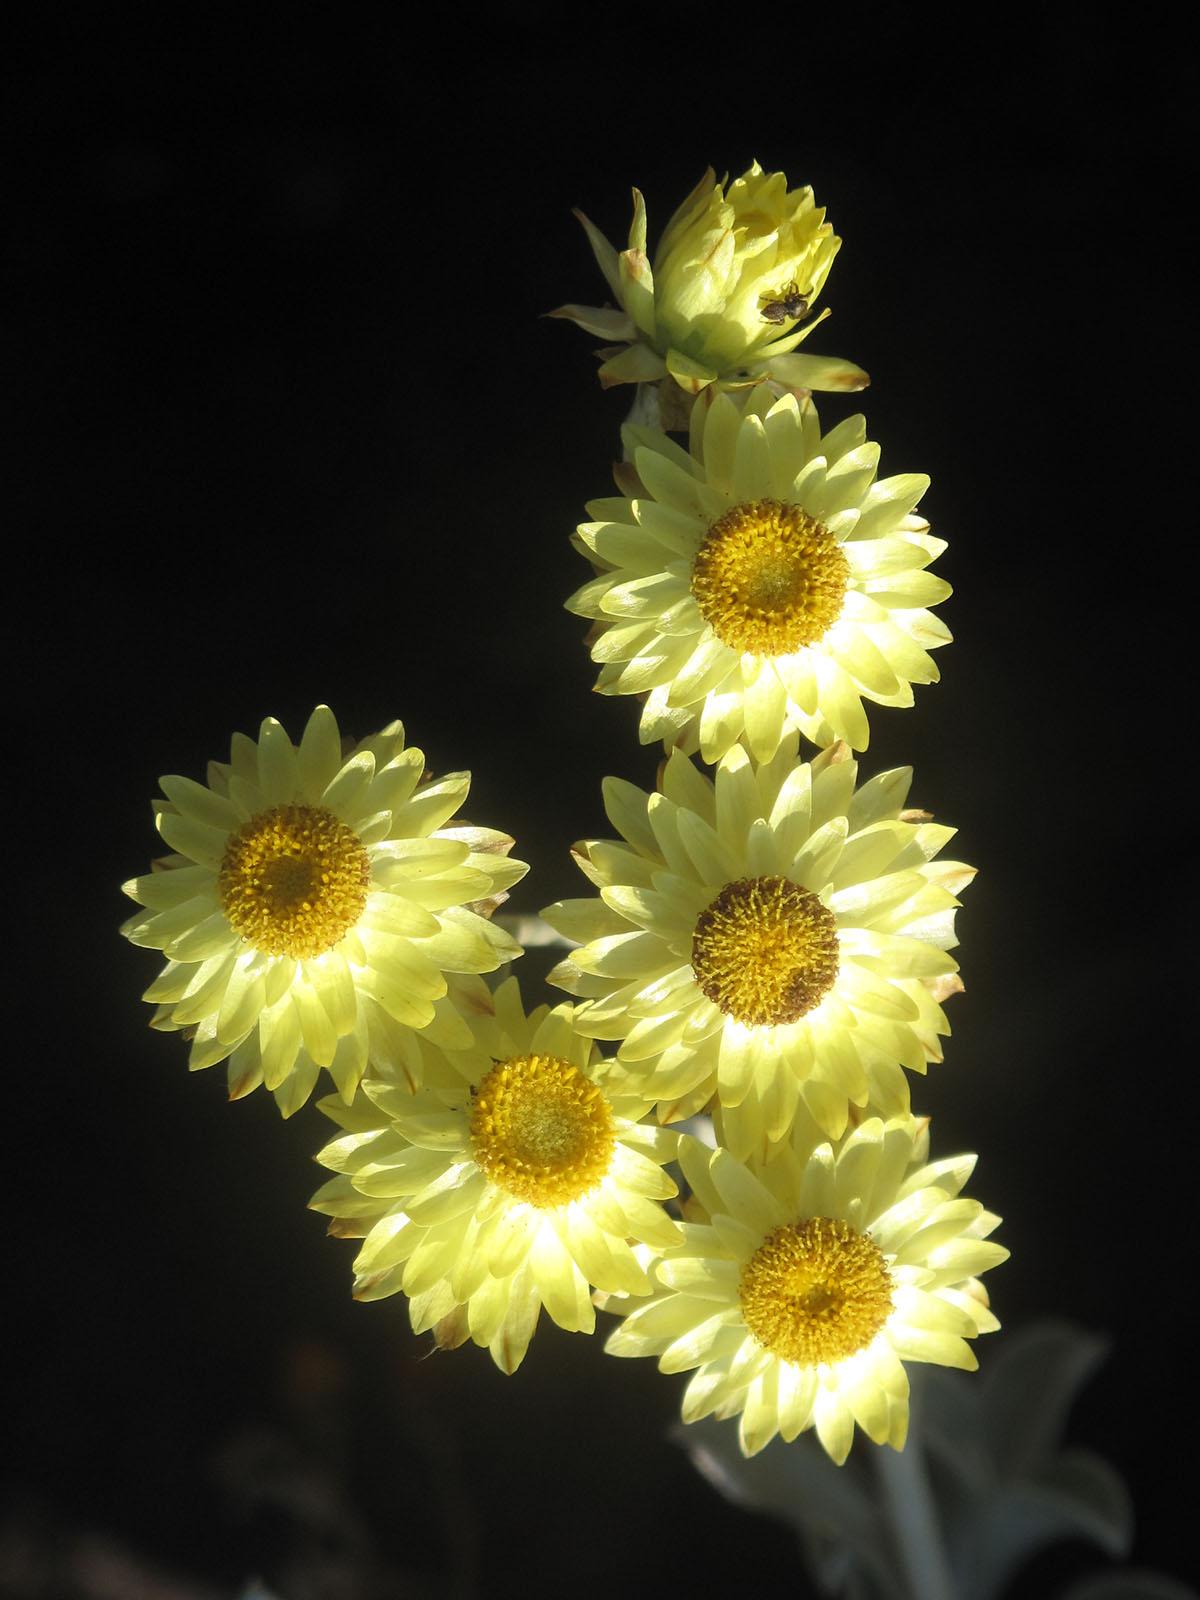 Helichrysum argyrophyllum 8